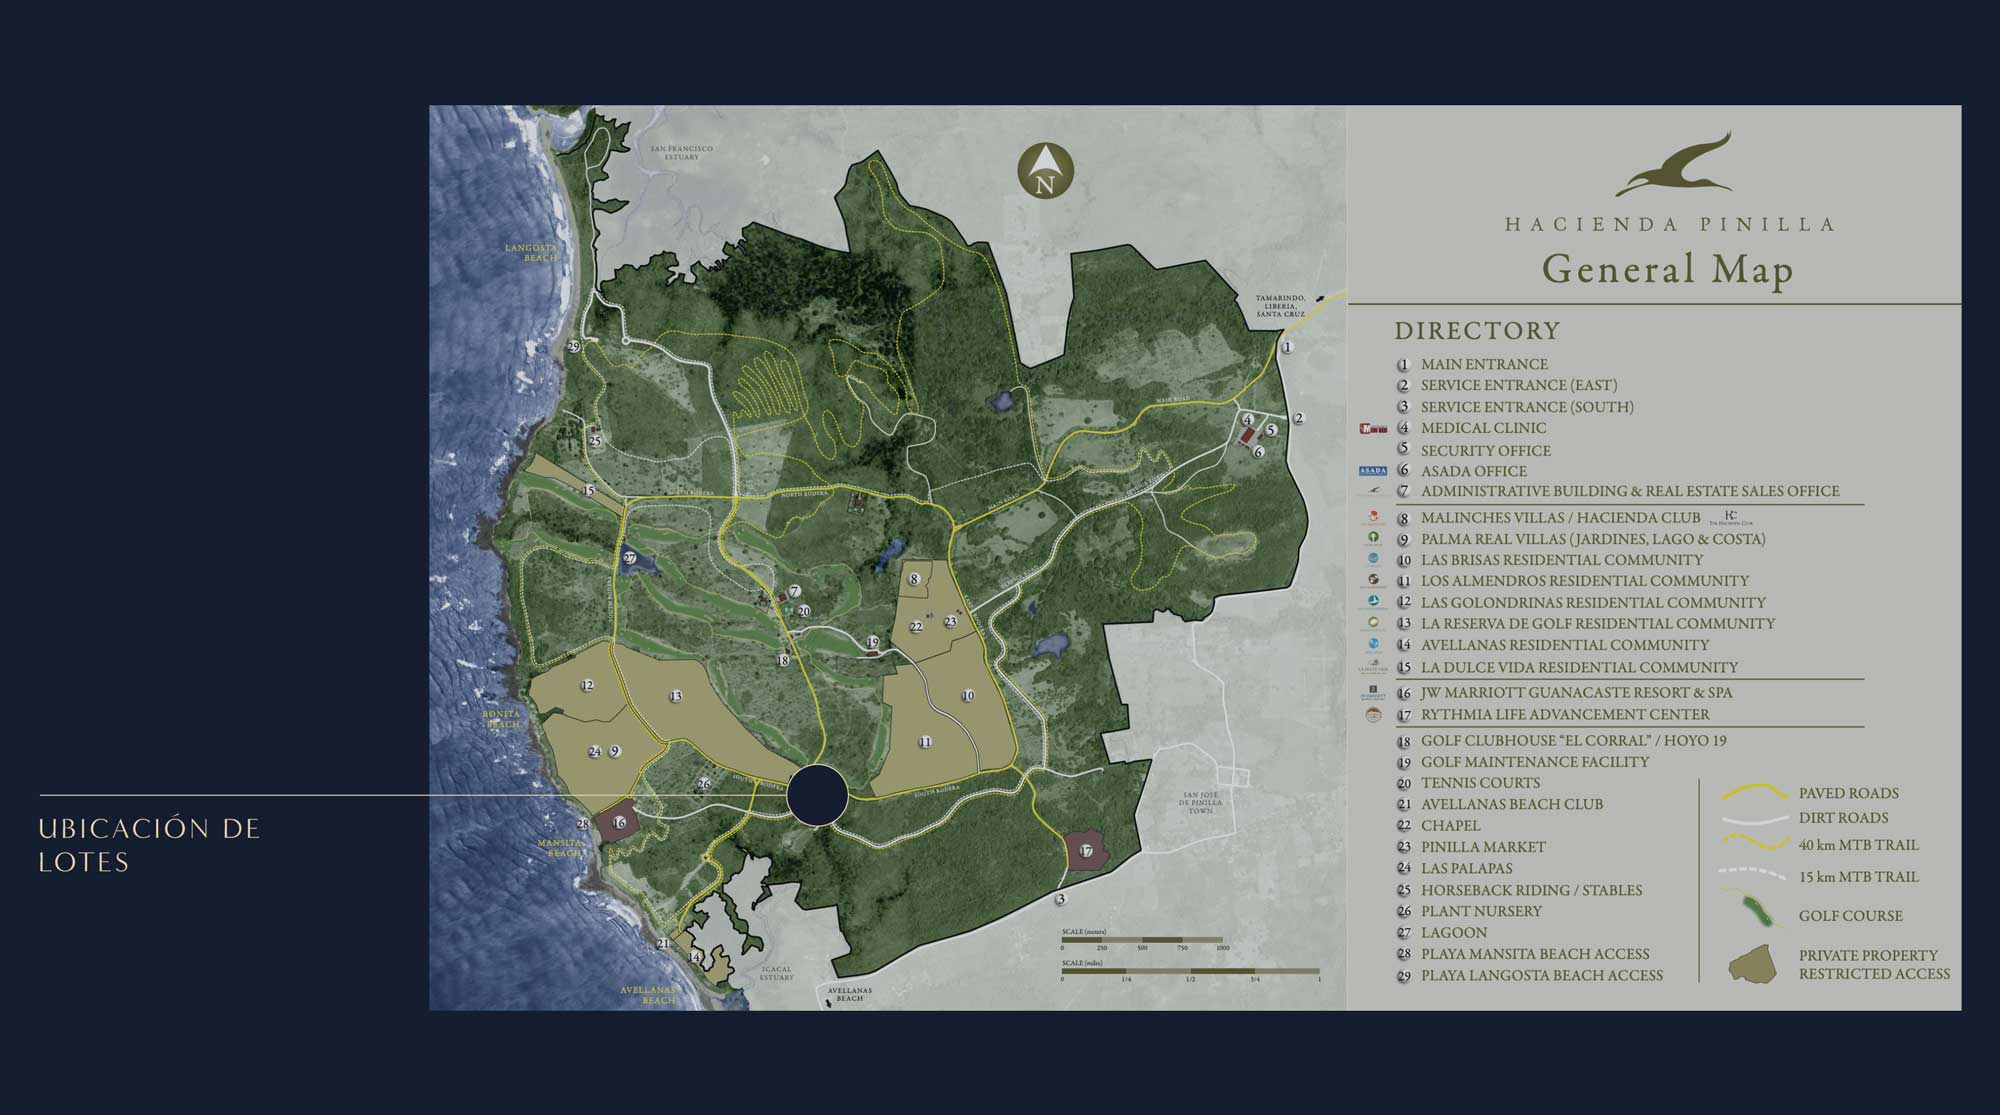 Pinilla_Beach_map3_web